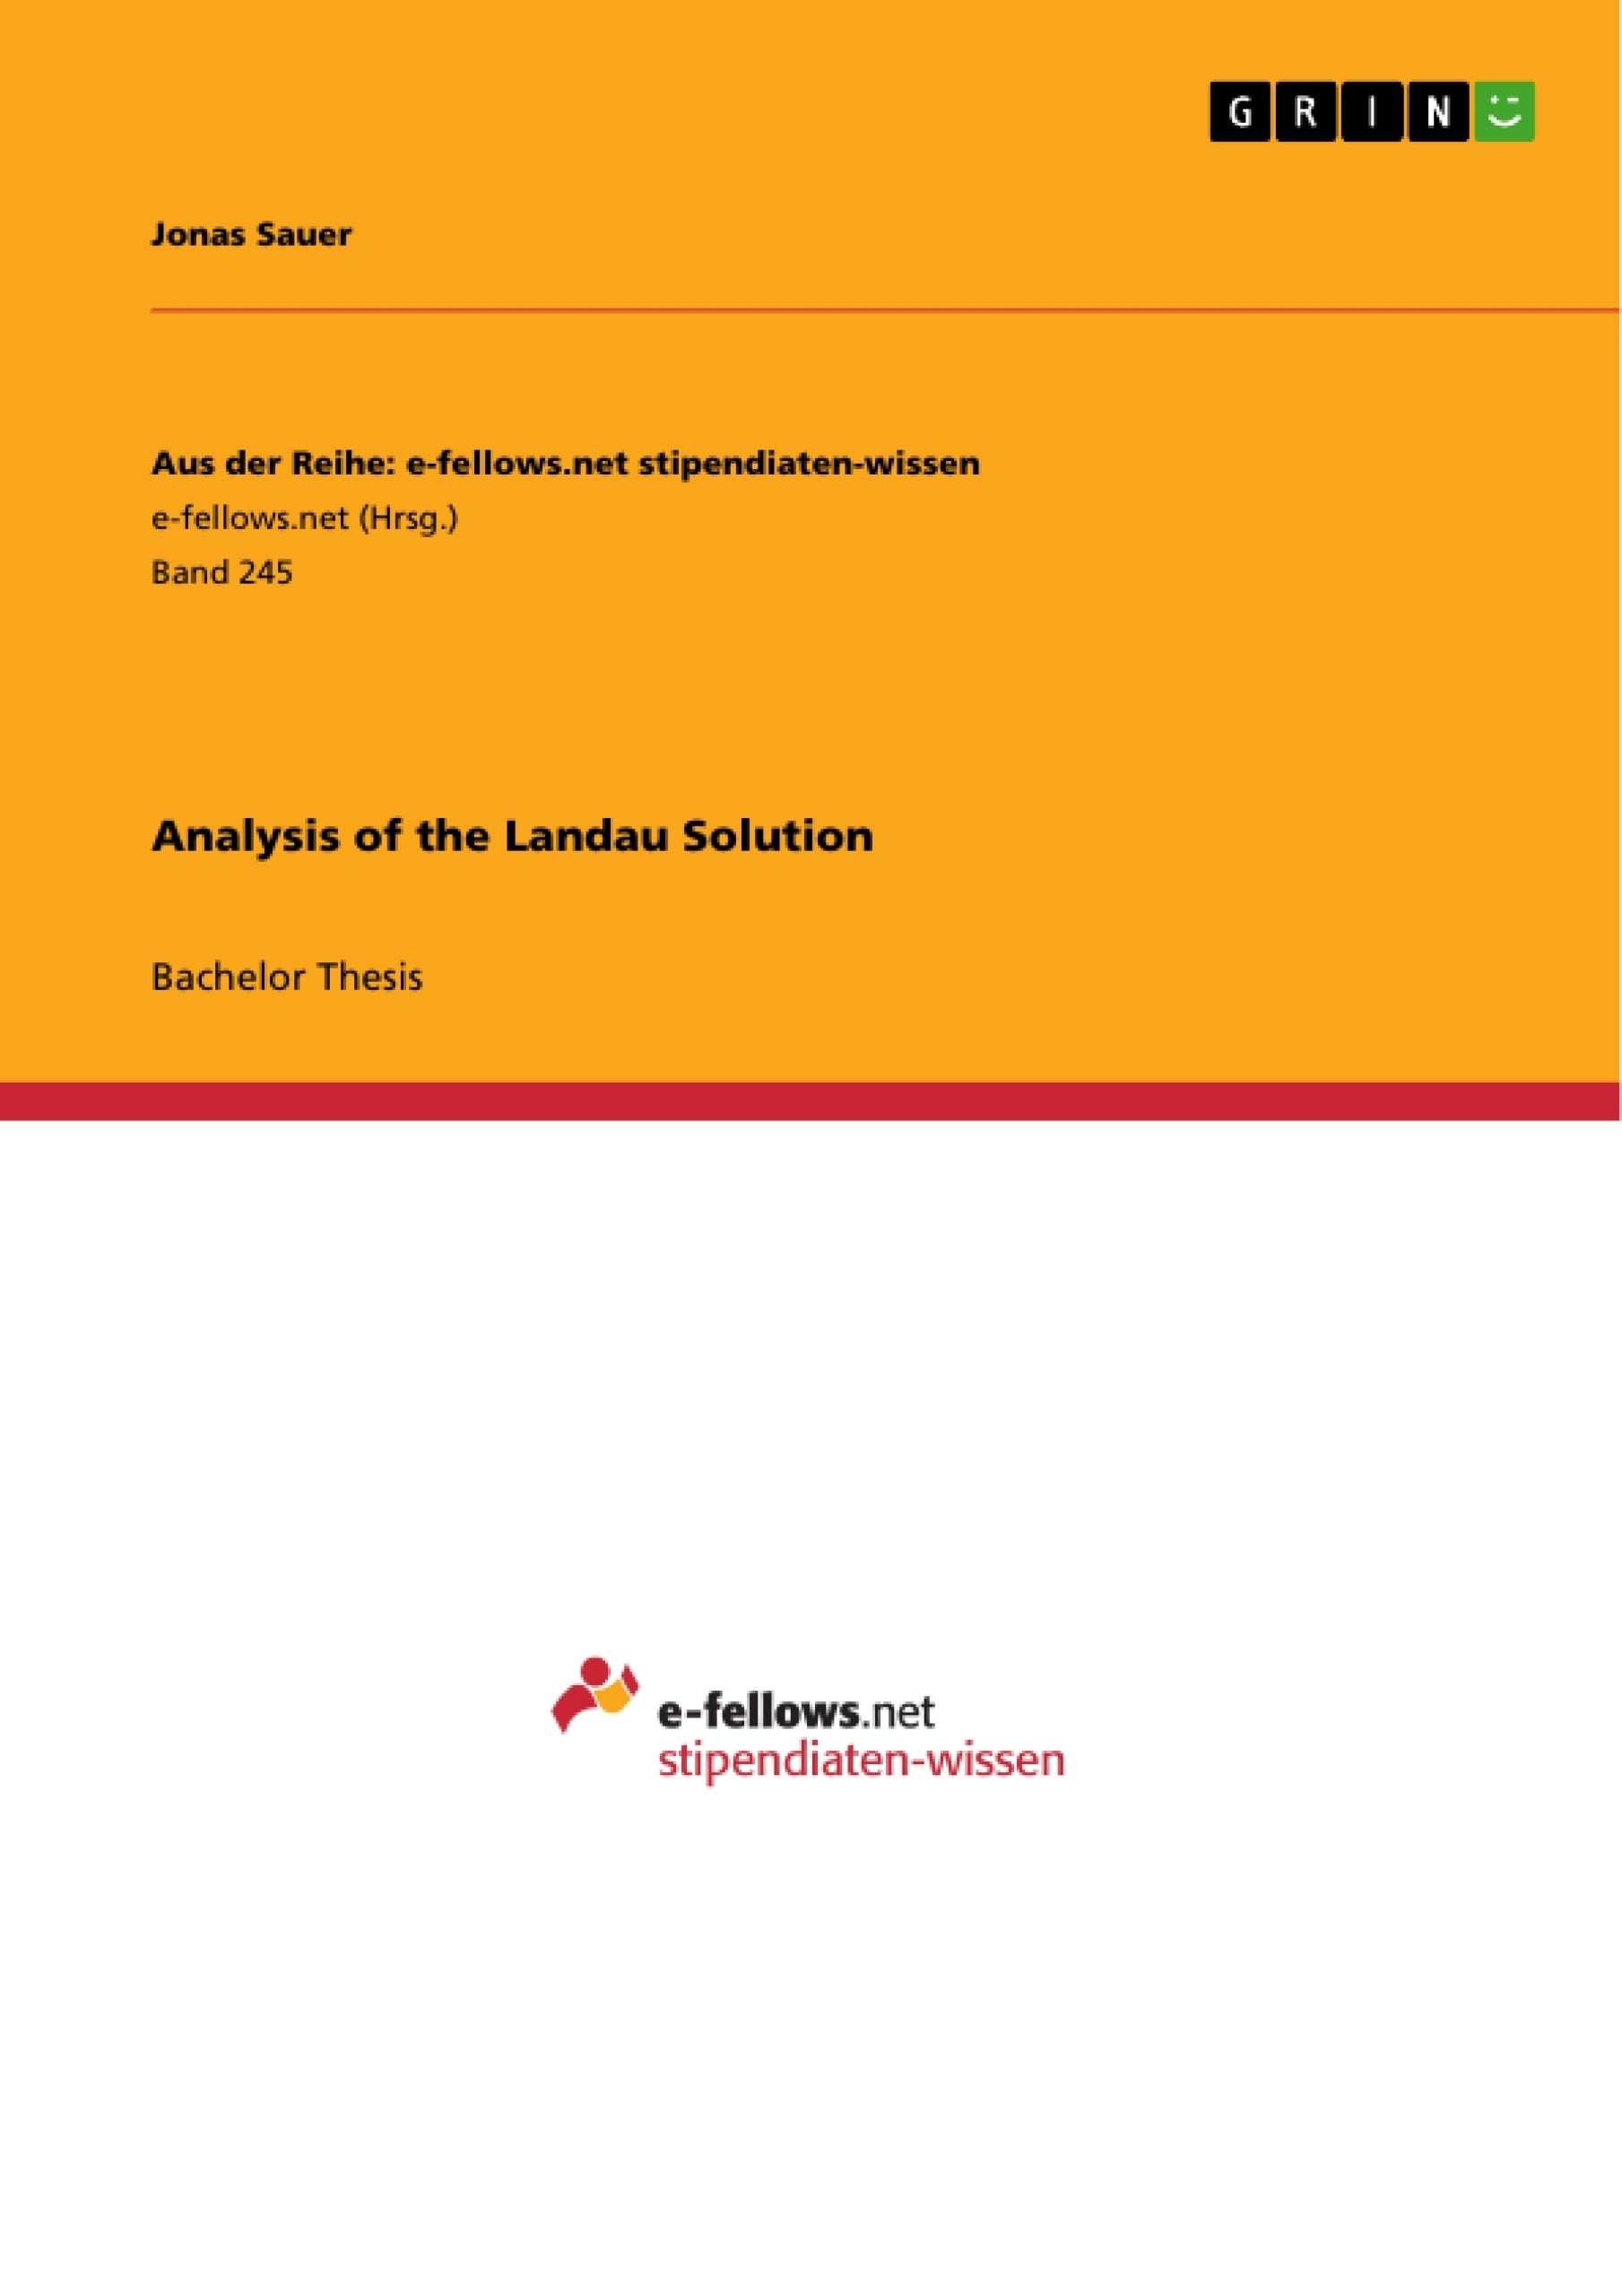 Title: Analysis of the Landau Solution